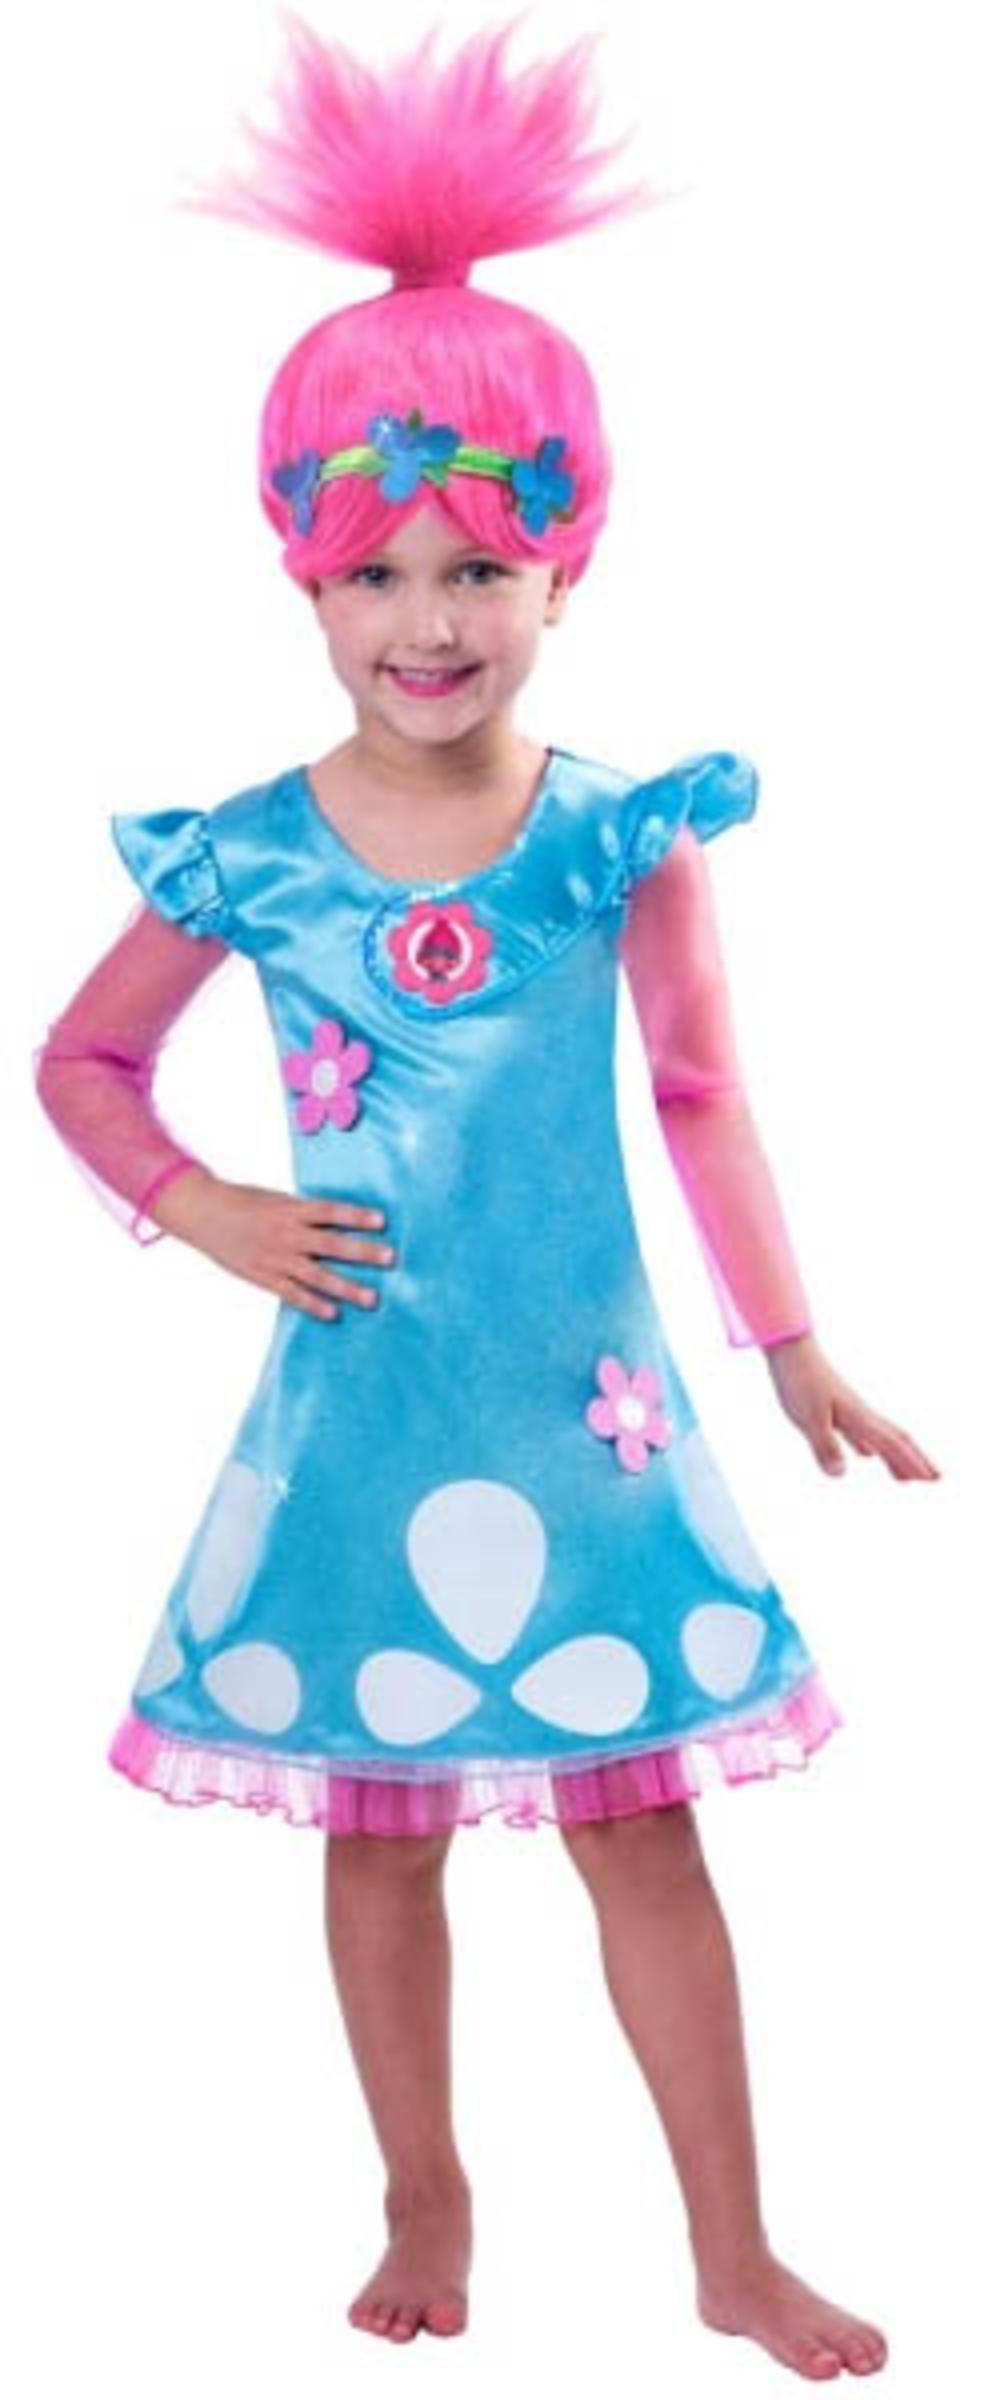 Trolls Princess Poppy Girls Fancy Dress TV Film Cartoon Character Kids Costume